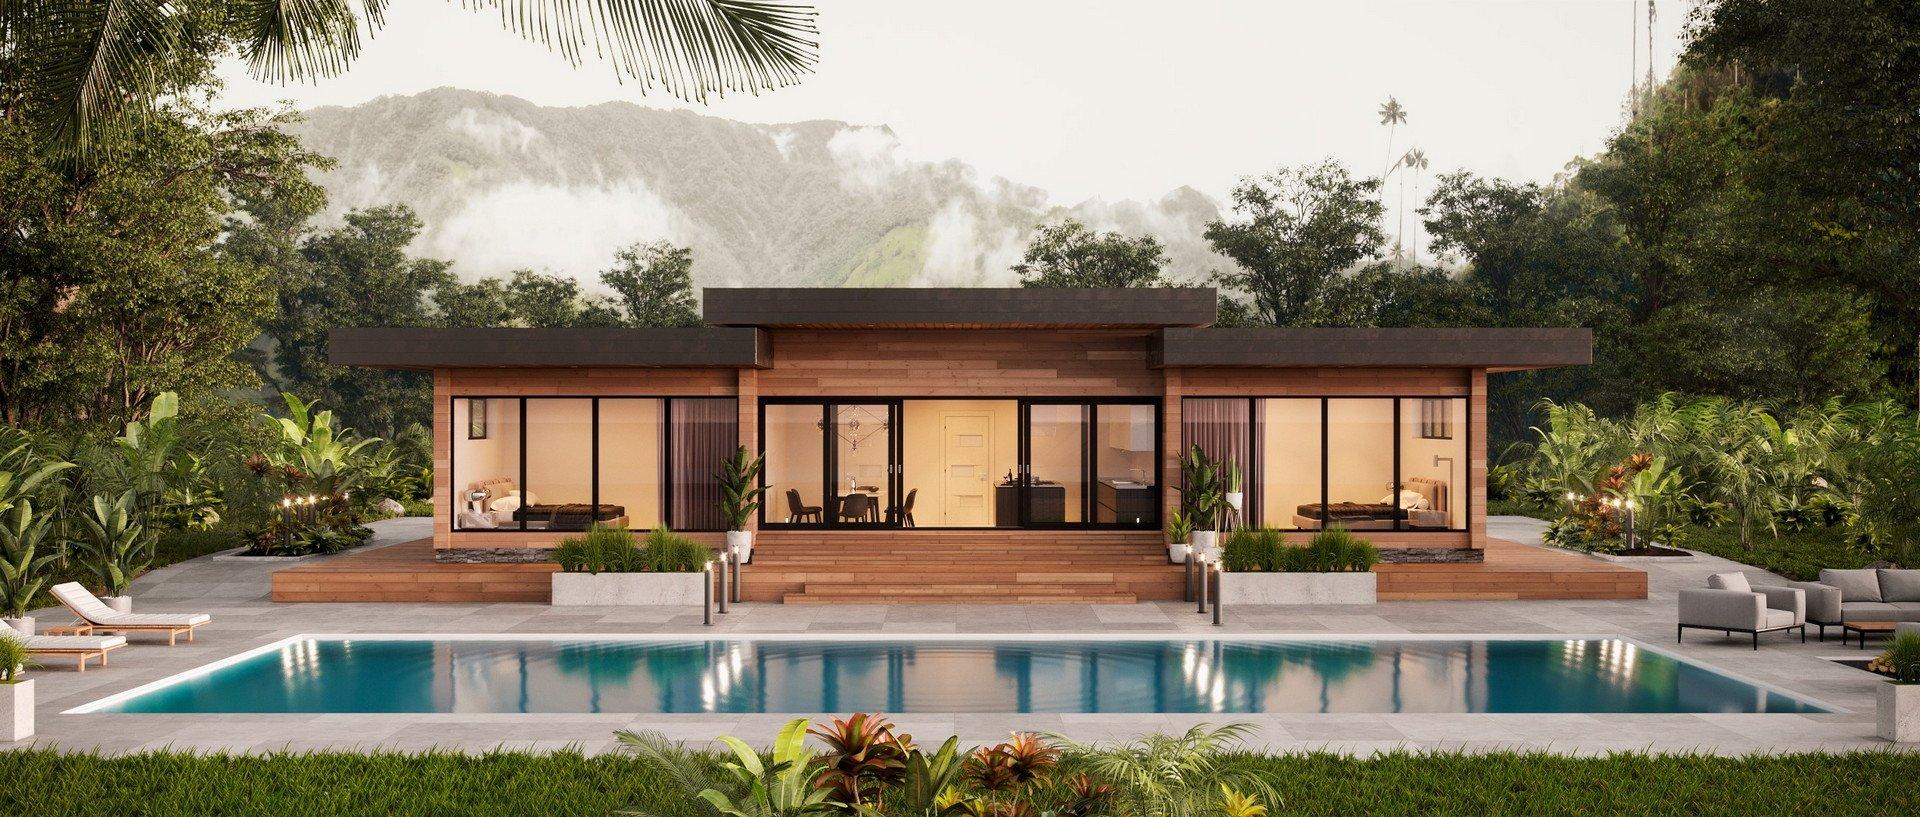 ᐉ Nature Prefab Modern Homes Faster